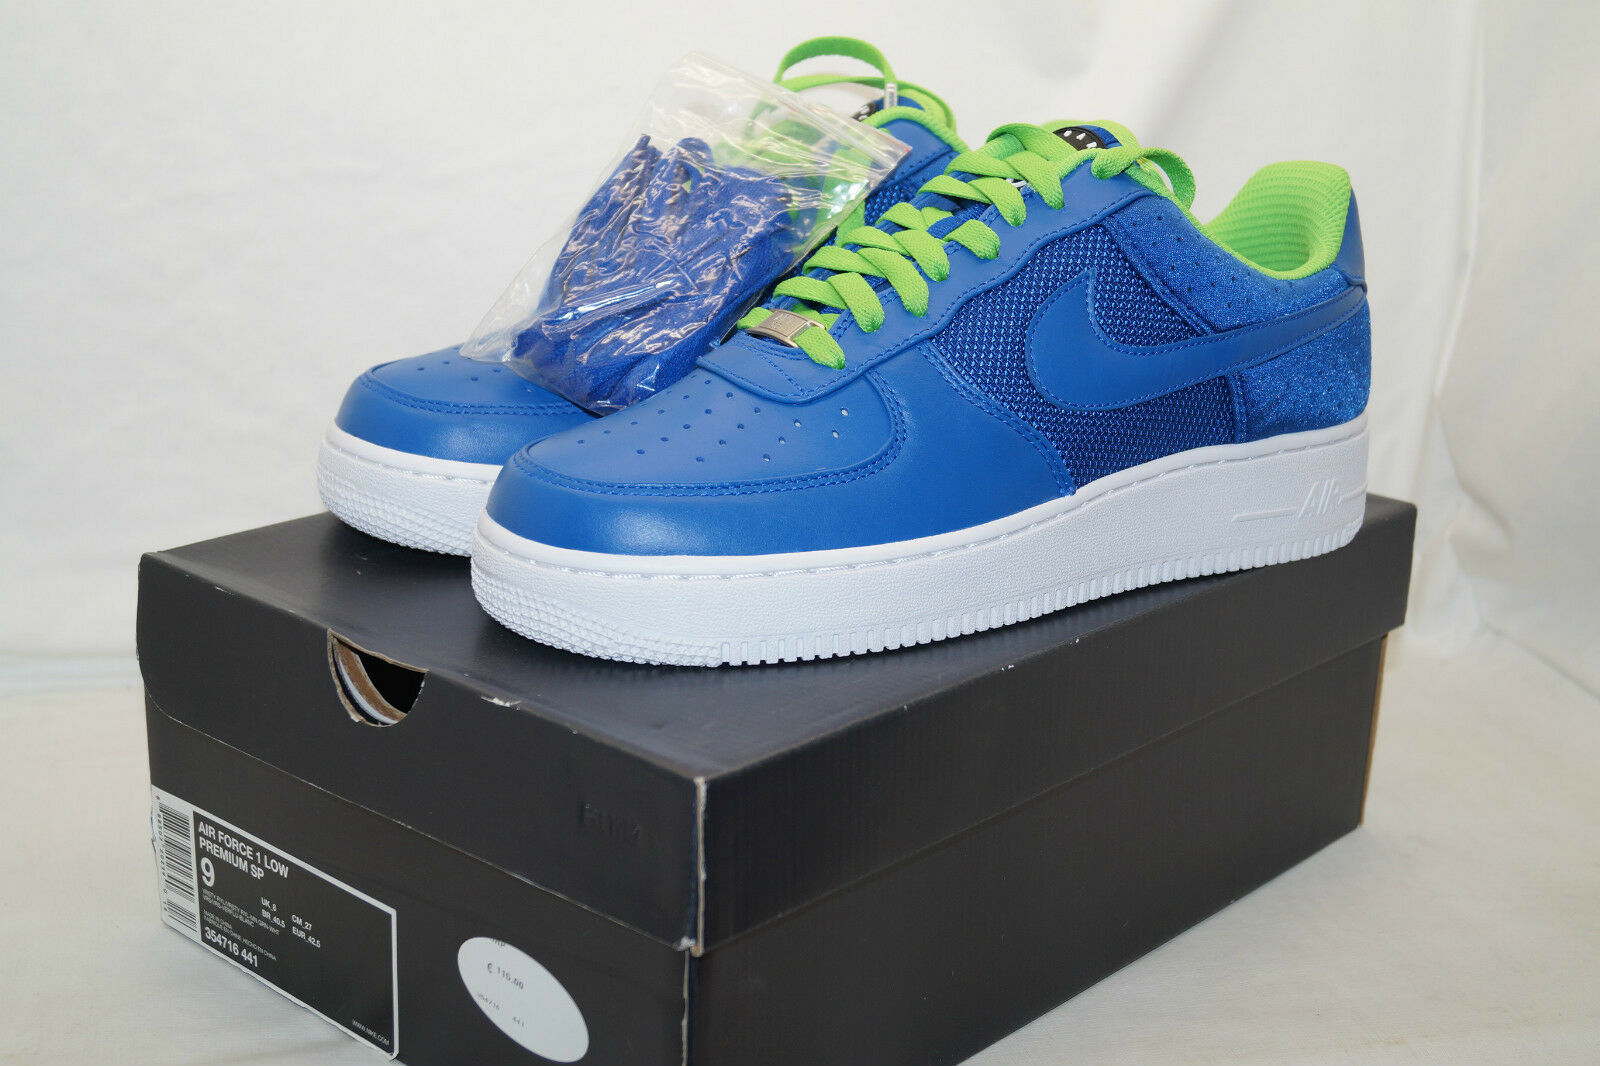 Nike Air Force sp af1 low premium sp Force huarache Limited azul Gr 42,5 45dc4c